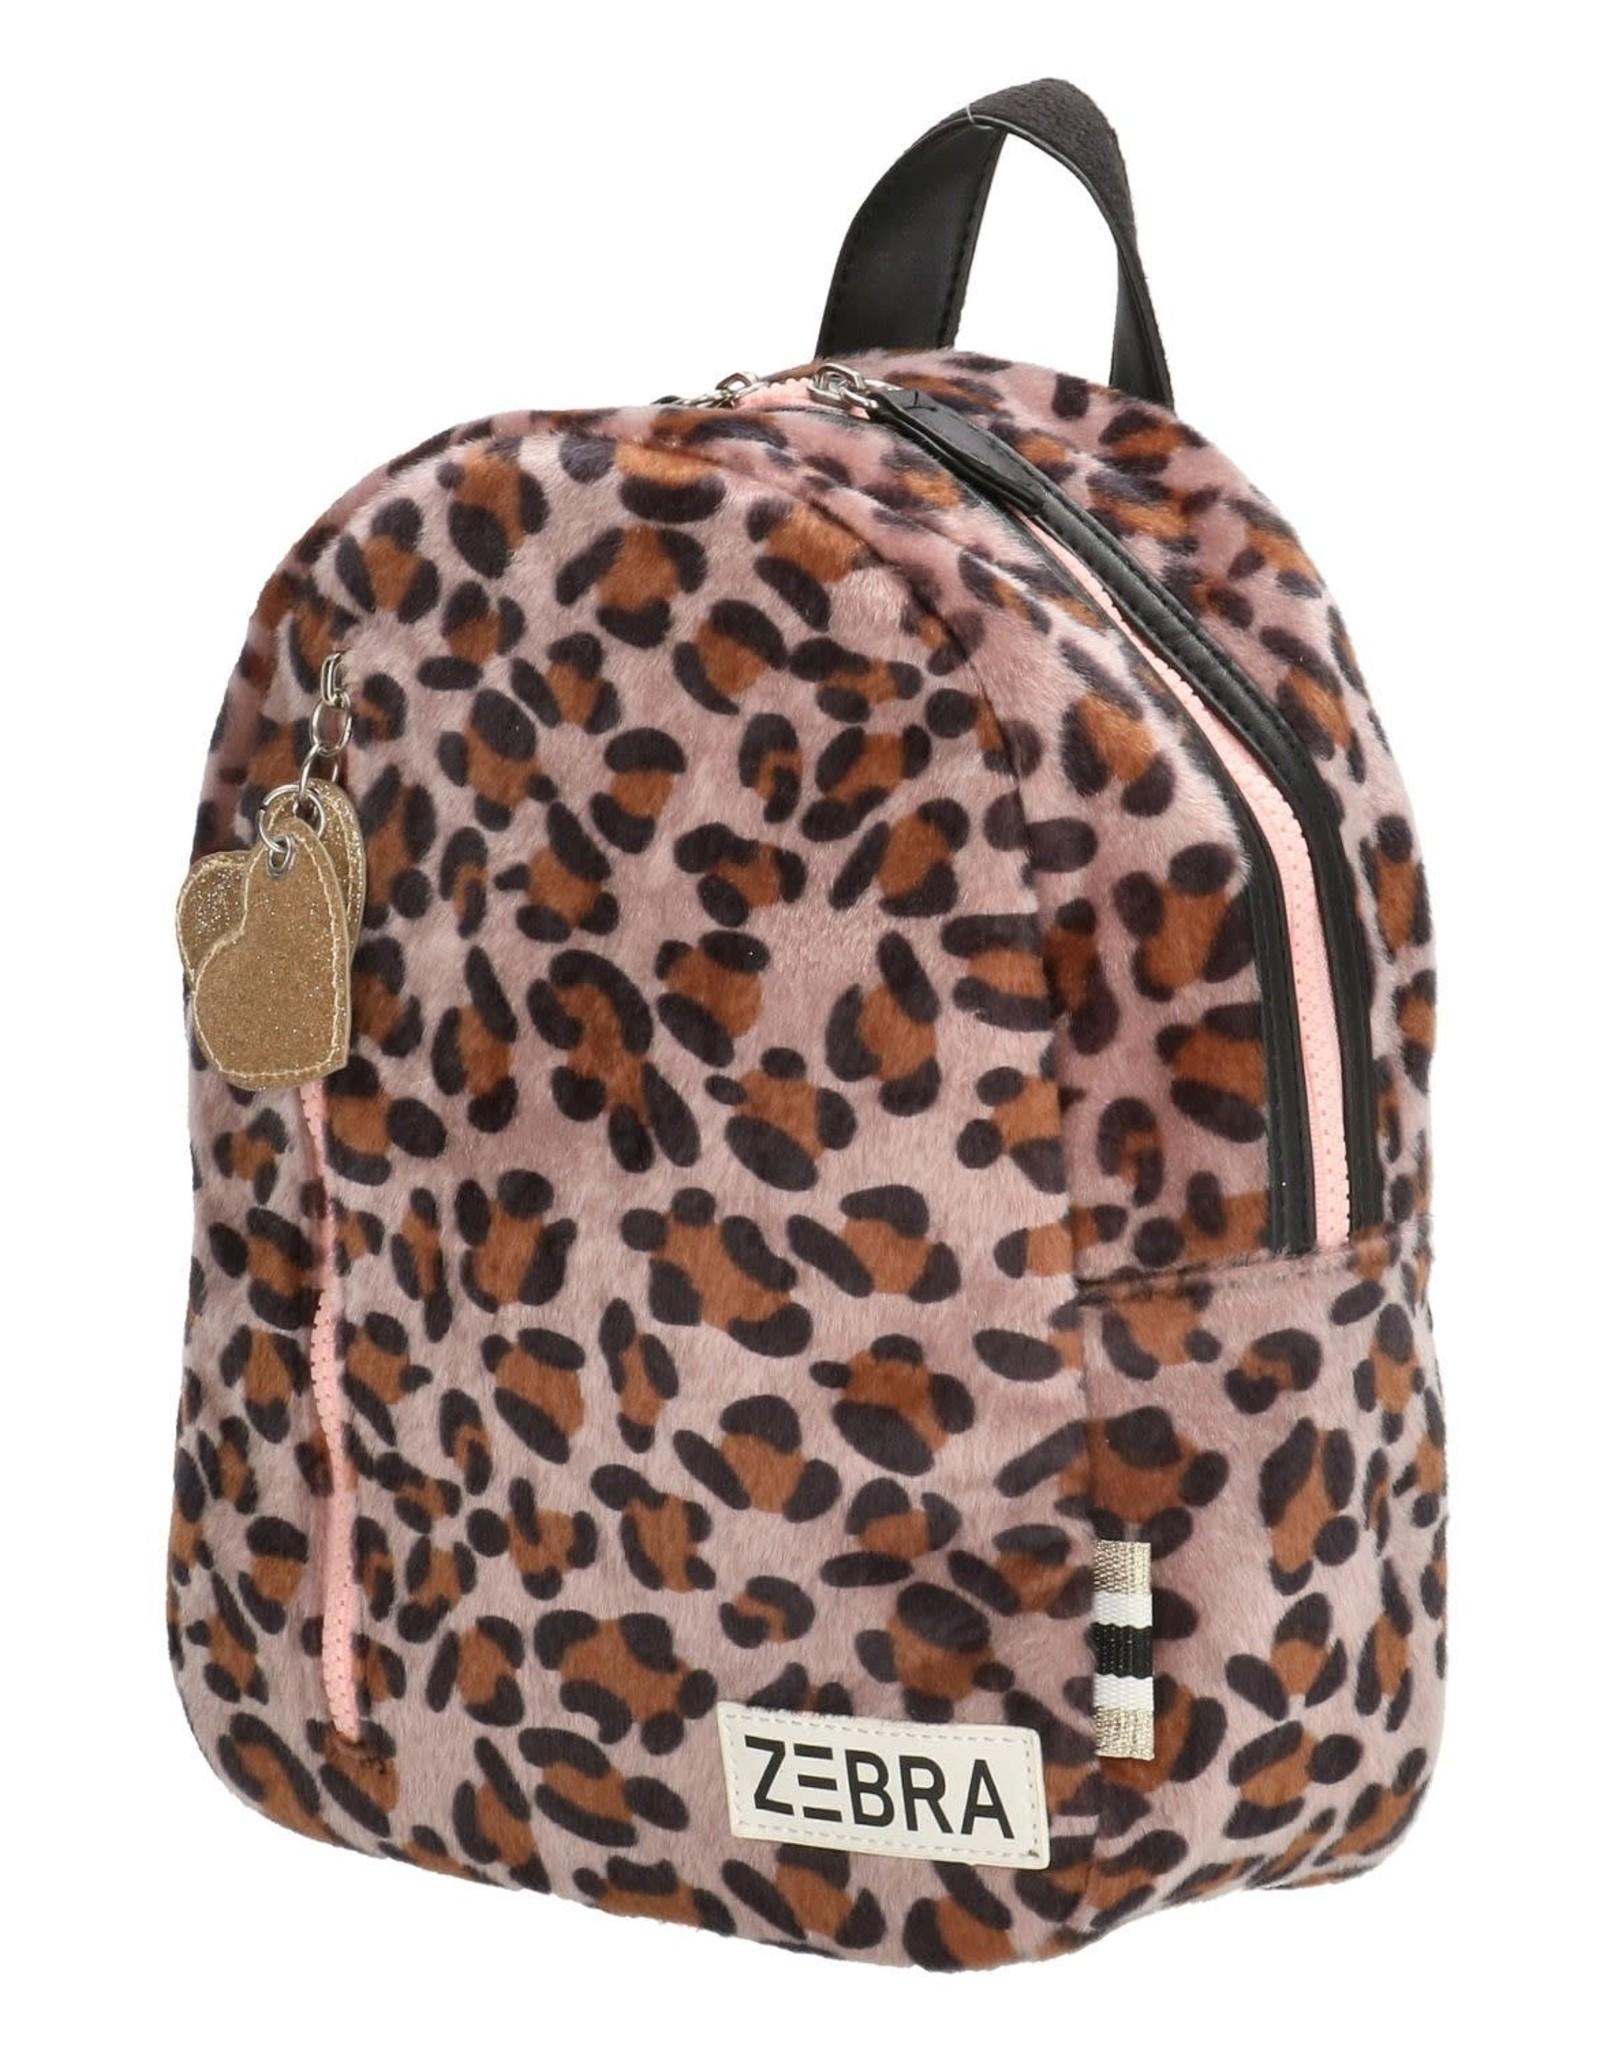 Zebra Trends Rugzak Velvet Leopard S